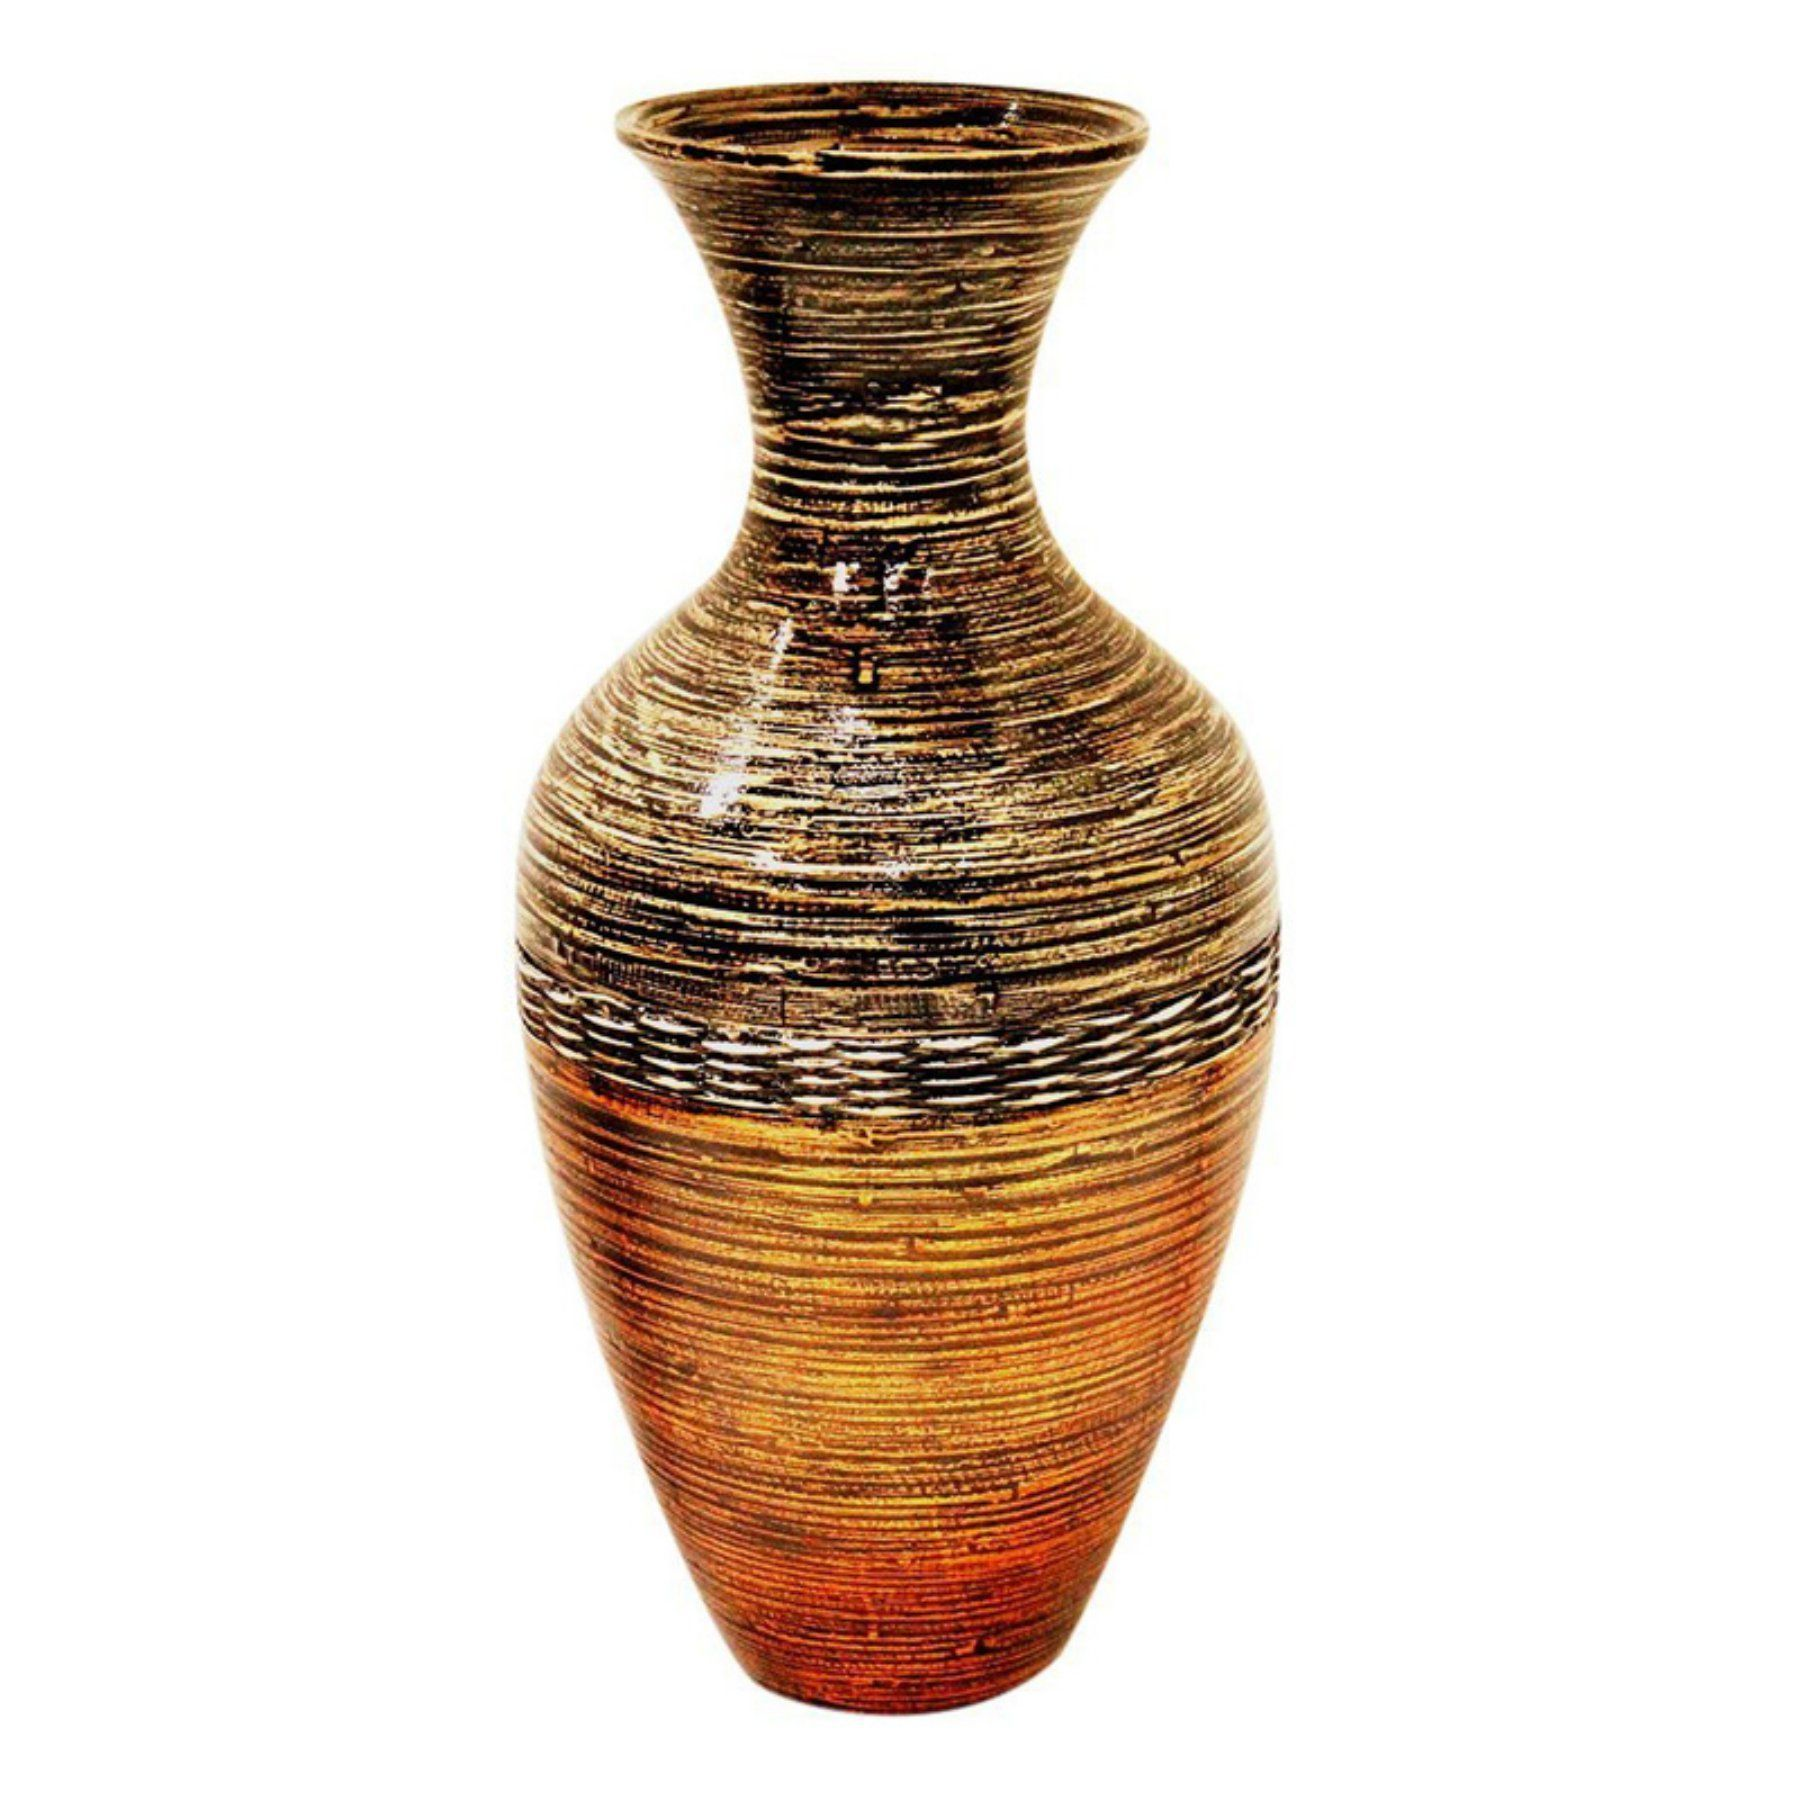 Heather Ann Creations Traditional Water Jug Bamboo Spun Decorative Vase W33902 Bgd